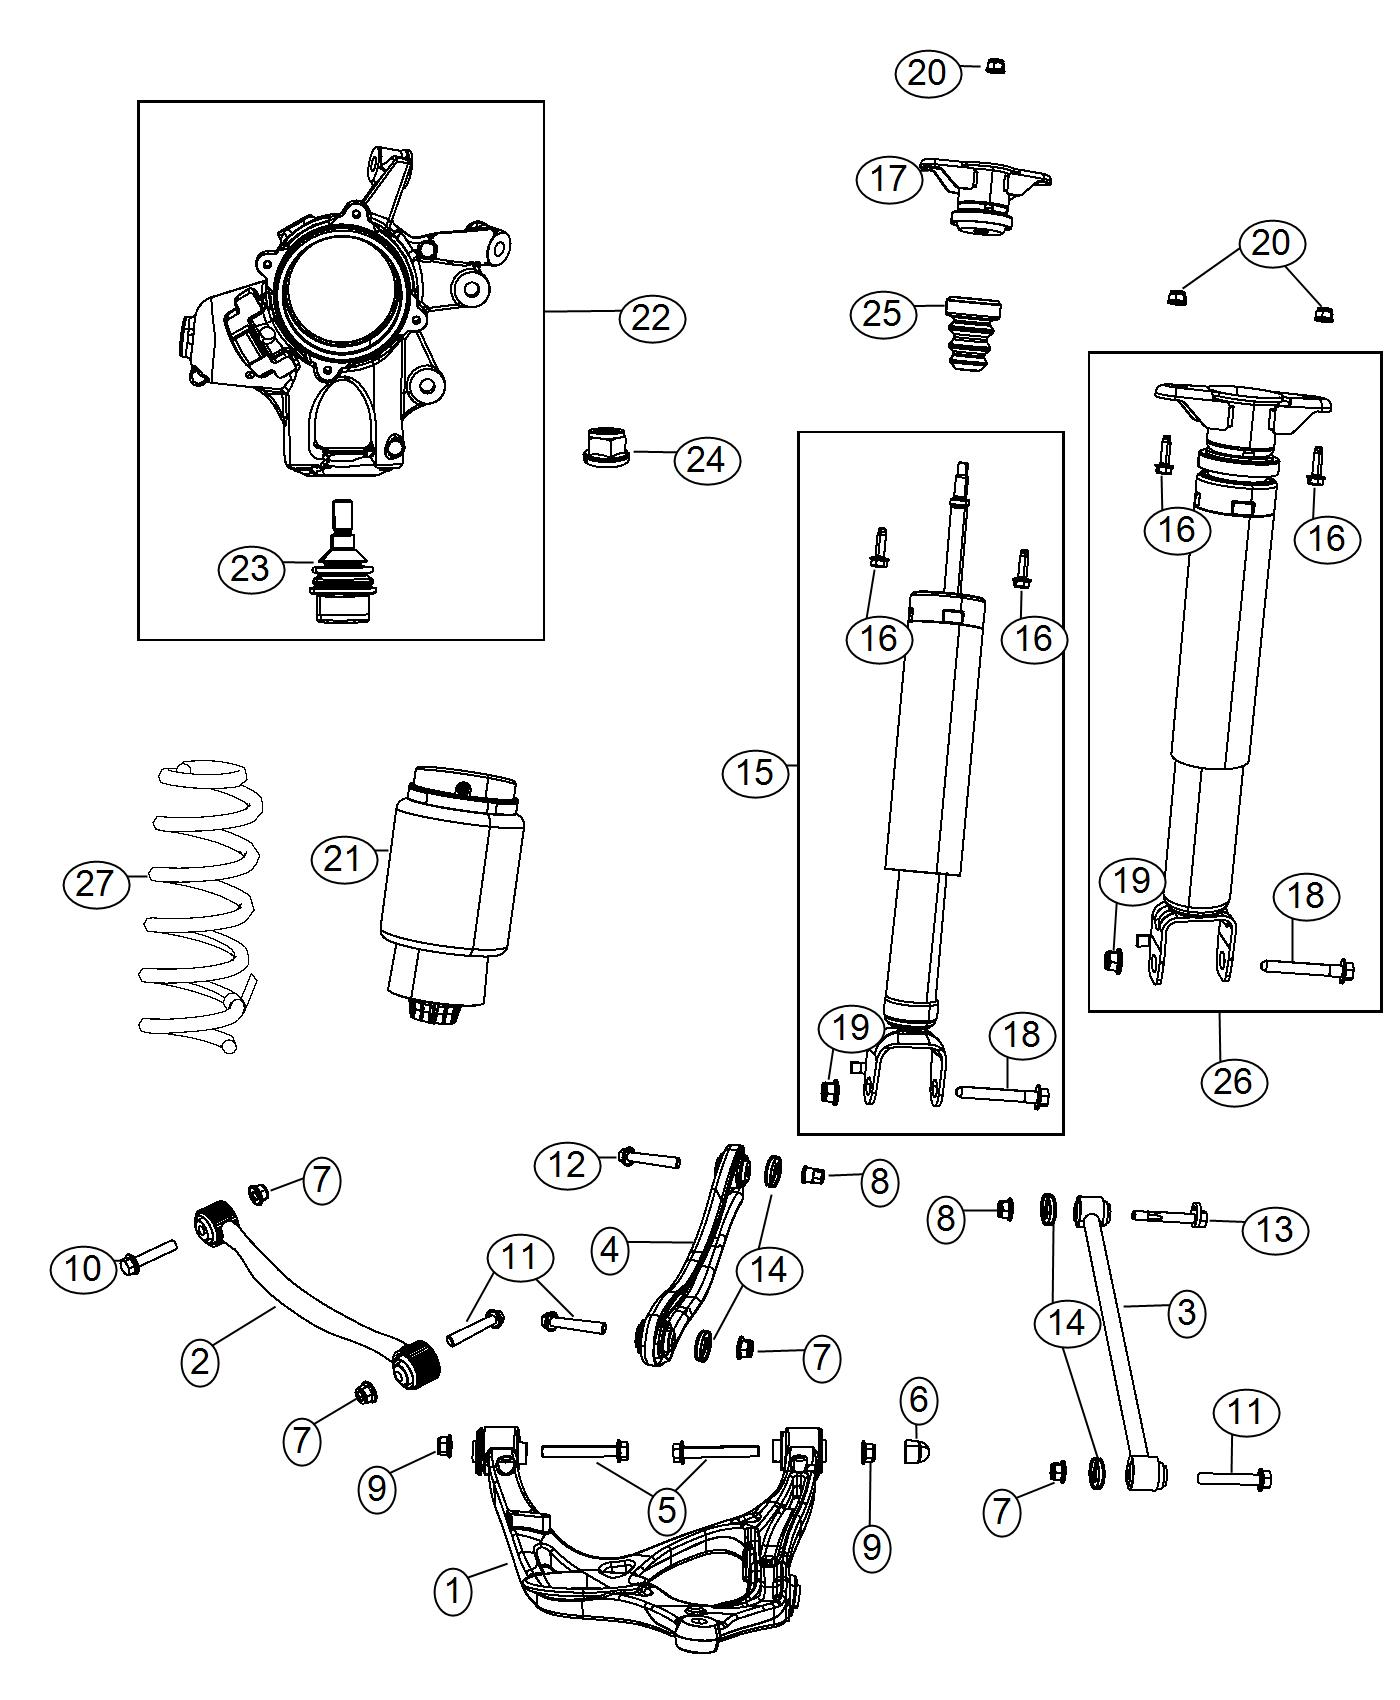 2016 Jeep Grand Cherokee Shock absorber kit. Suspension